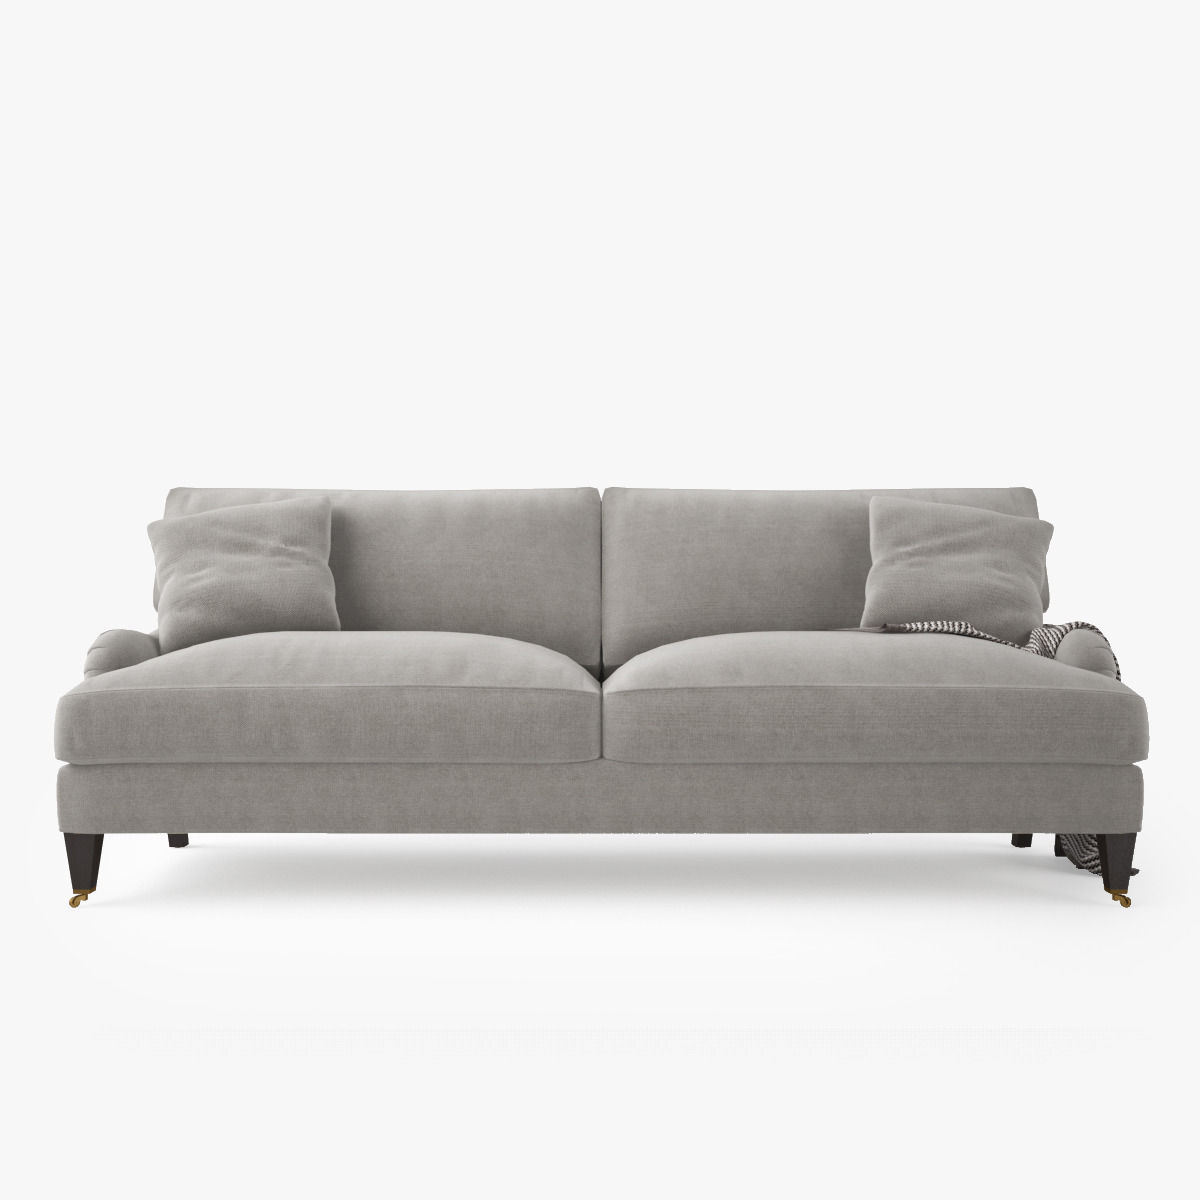 essex sofas corner sofa bed finance uk crate and barrel collection 3d model max obj